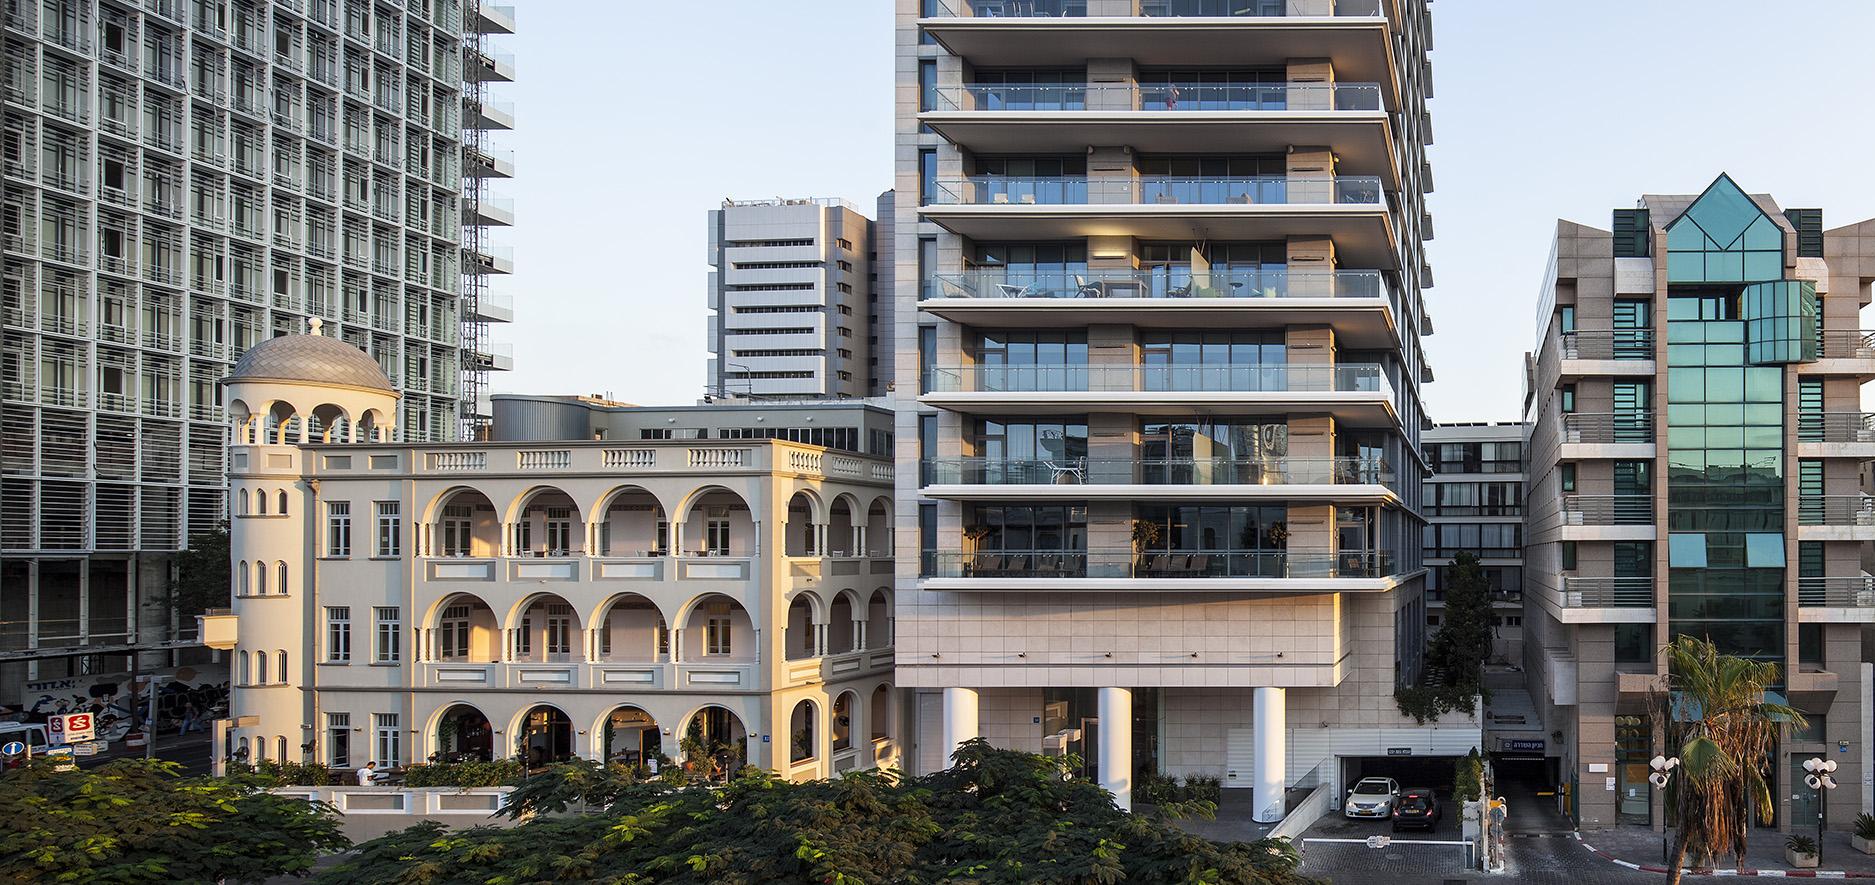 Rothschild_30_Tower_Tel_Aviv_planned_By_Kolker_Epstein_Architects7